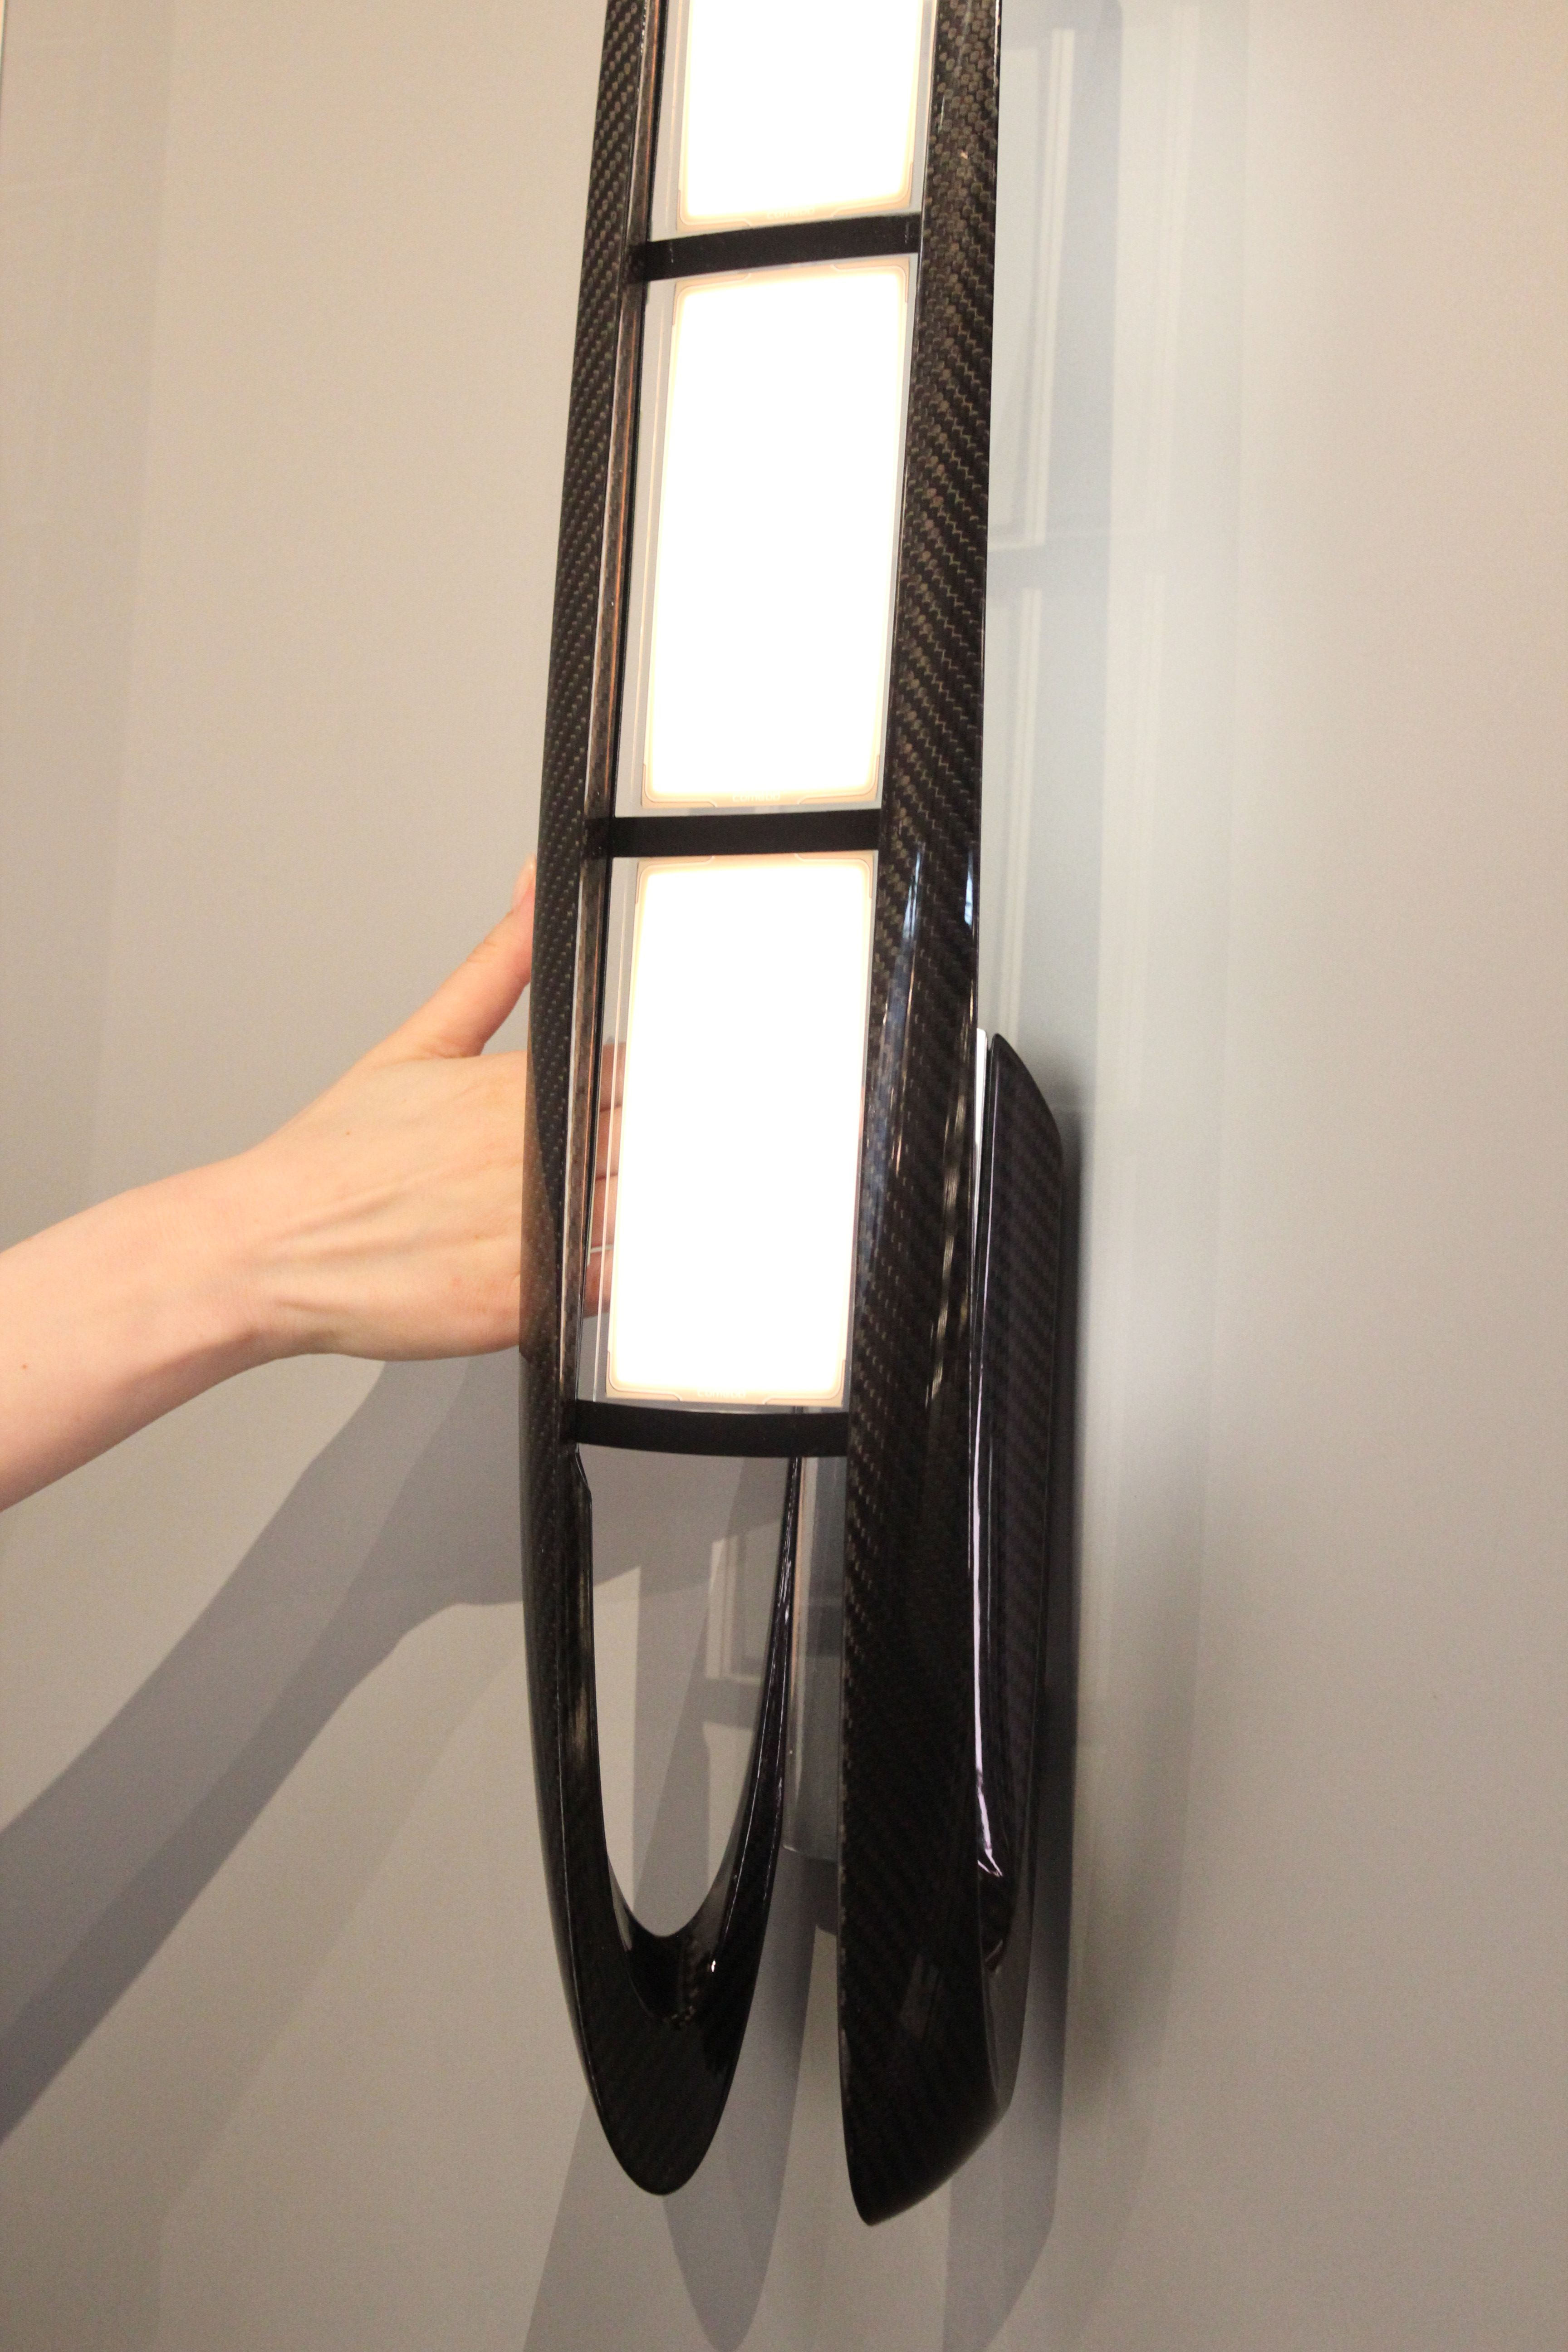 Transparent Oled Lighting Panels Beleuchtung Leuchten Lampen